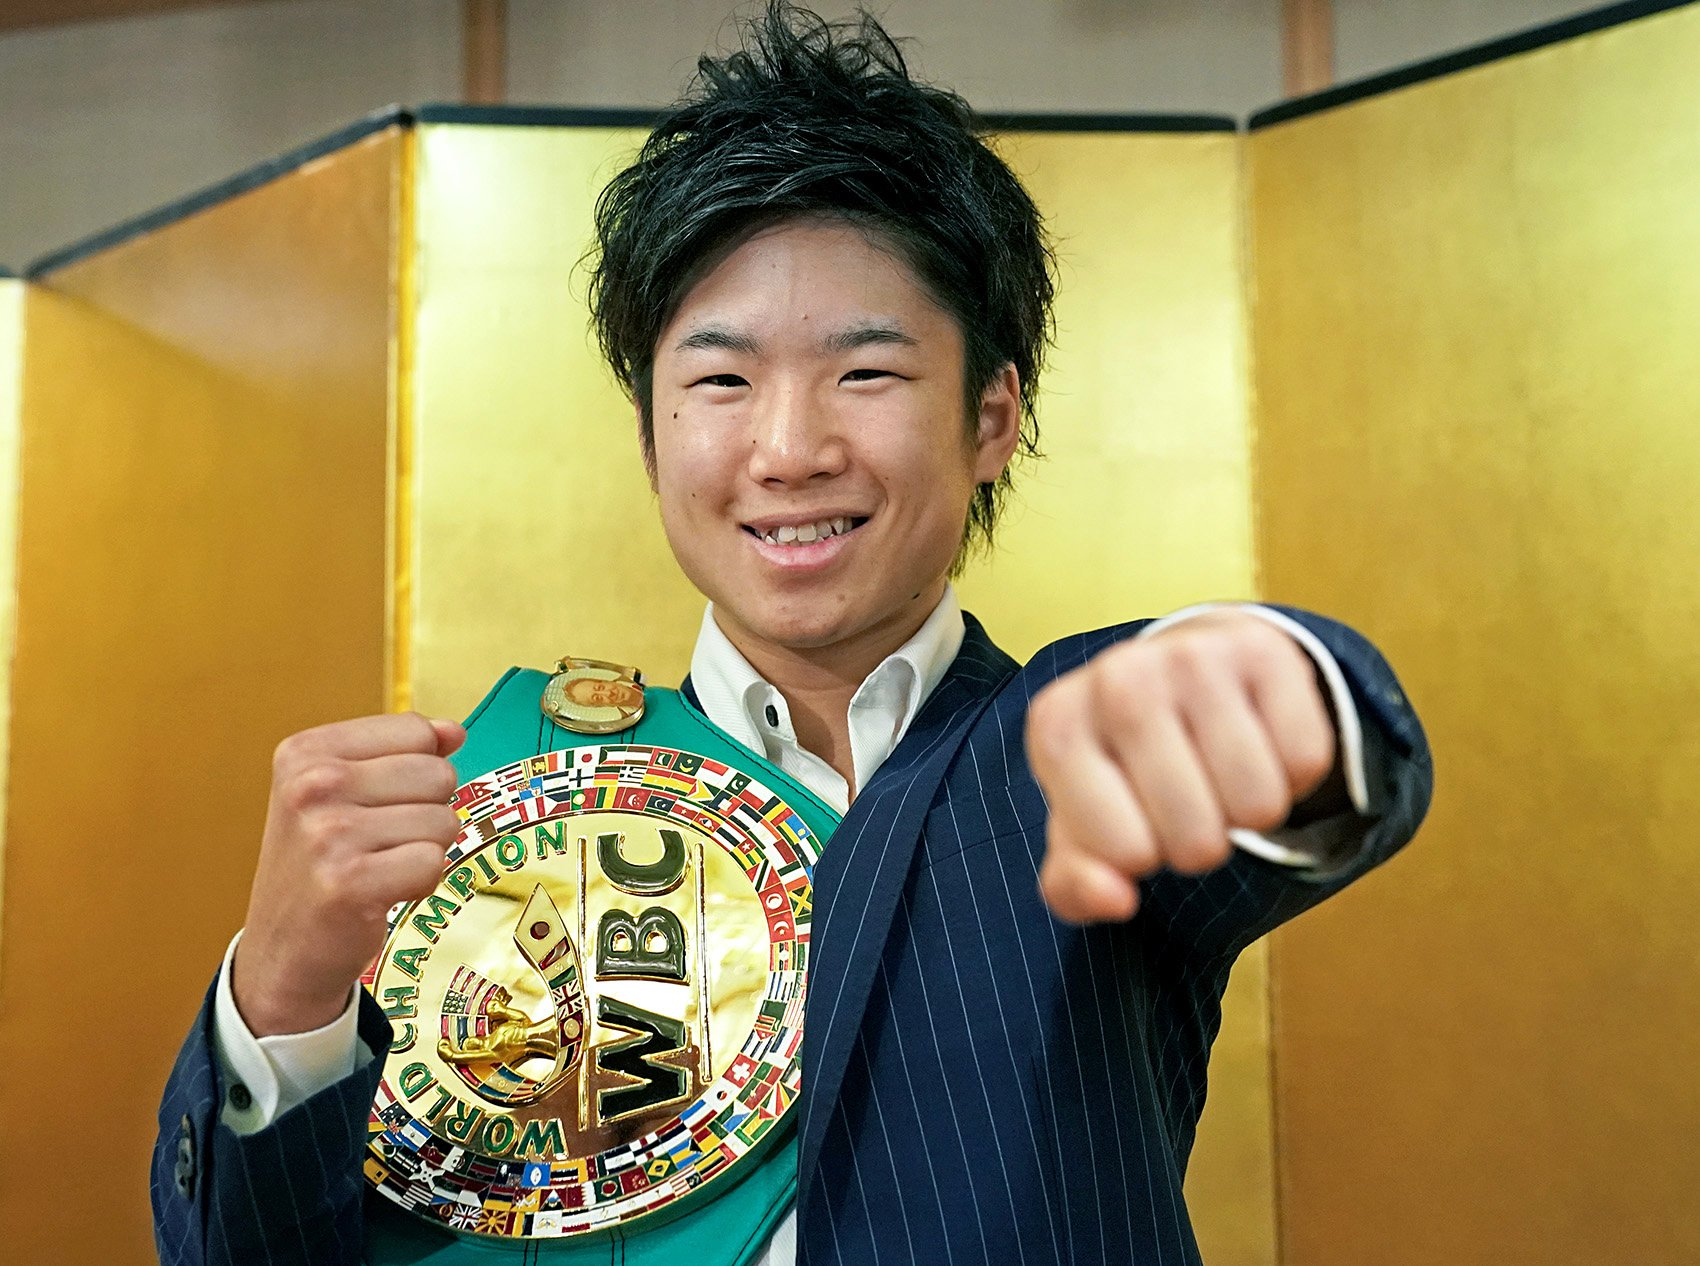 Kenshiro Teraji: You will see me overwhelm Masamichi Yabuki without taking even a single punch